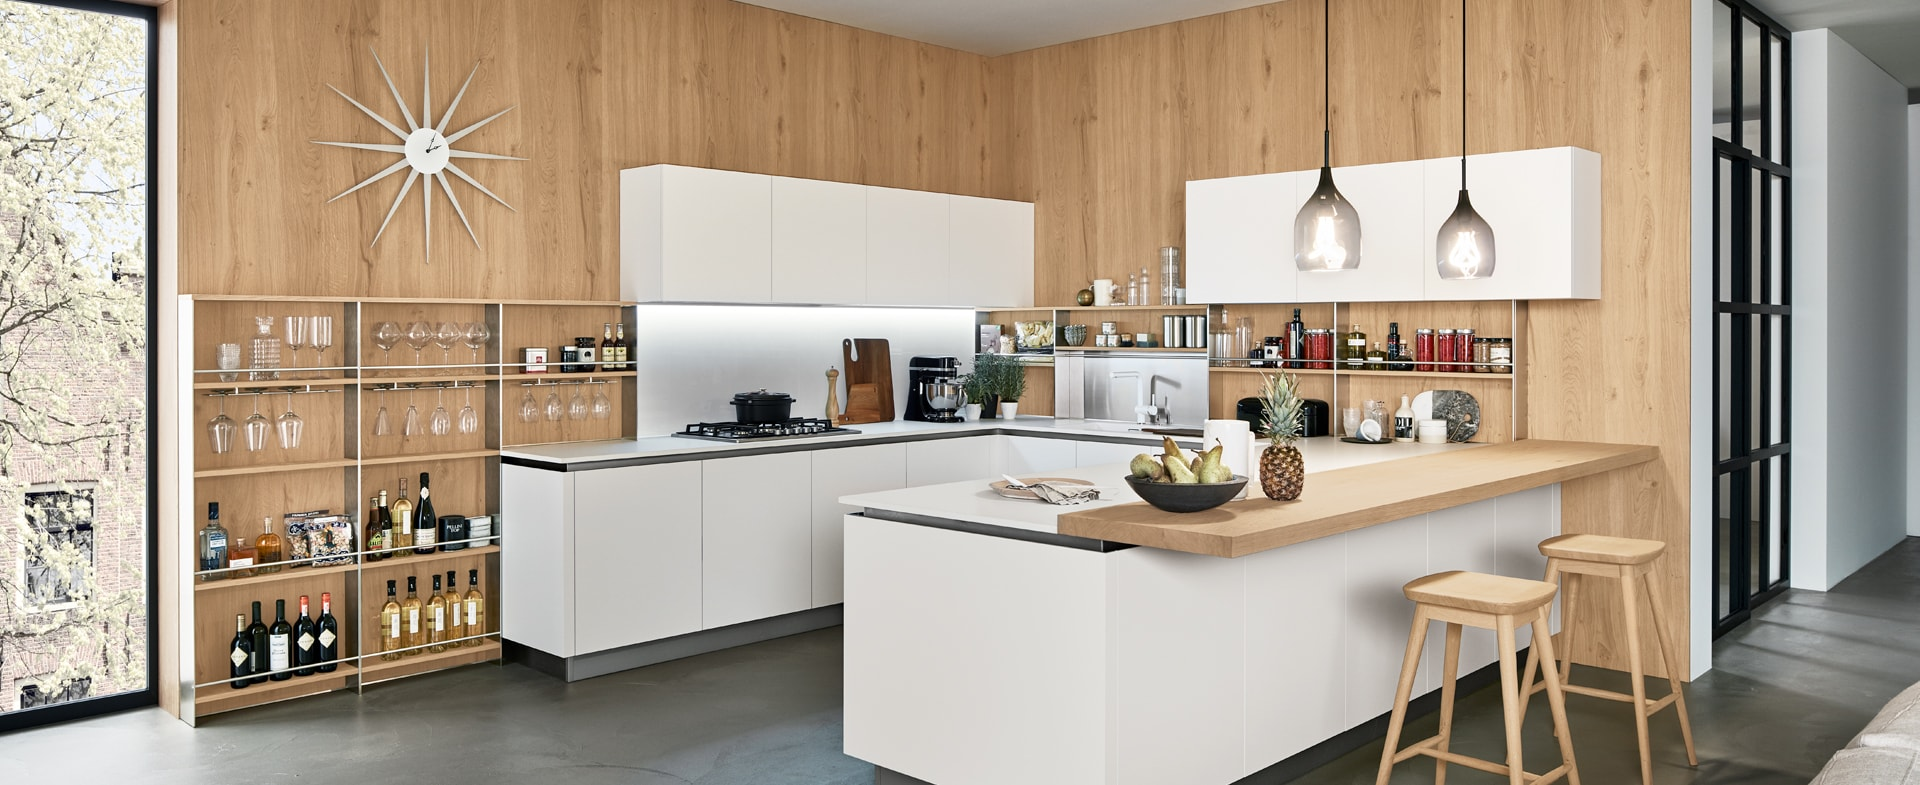 Cuisine moderne: meubles er modèles